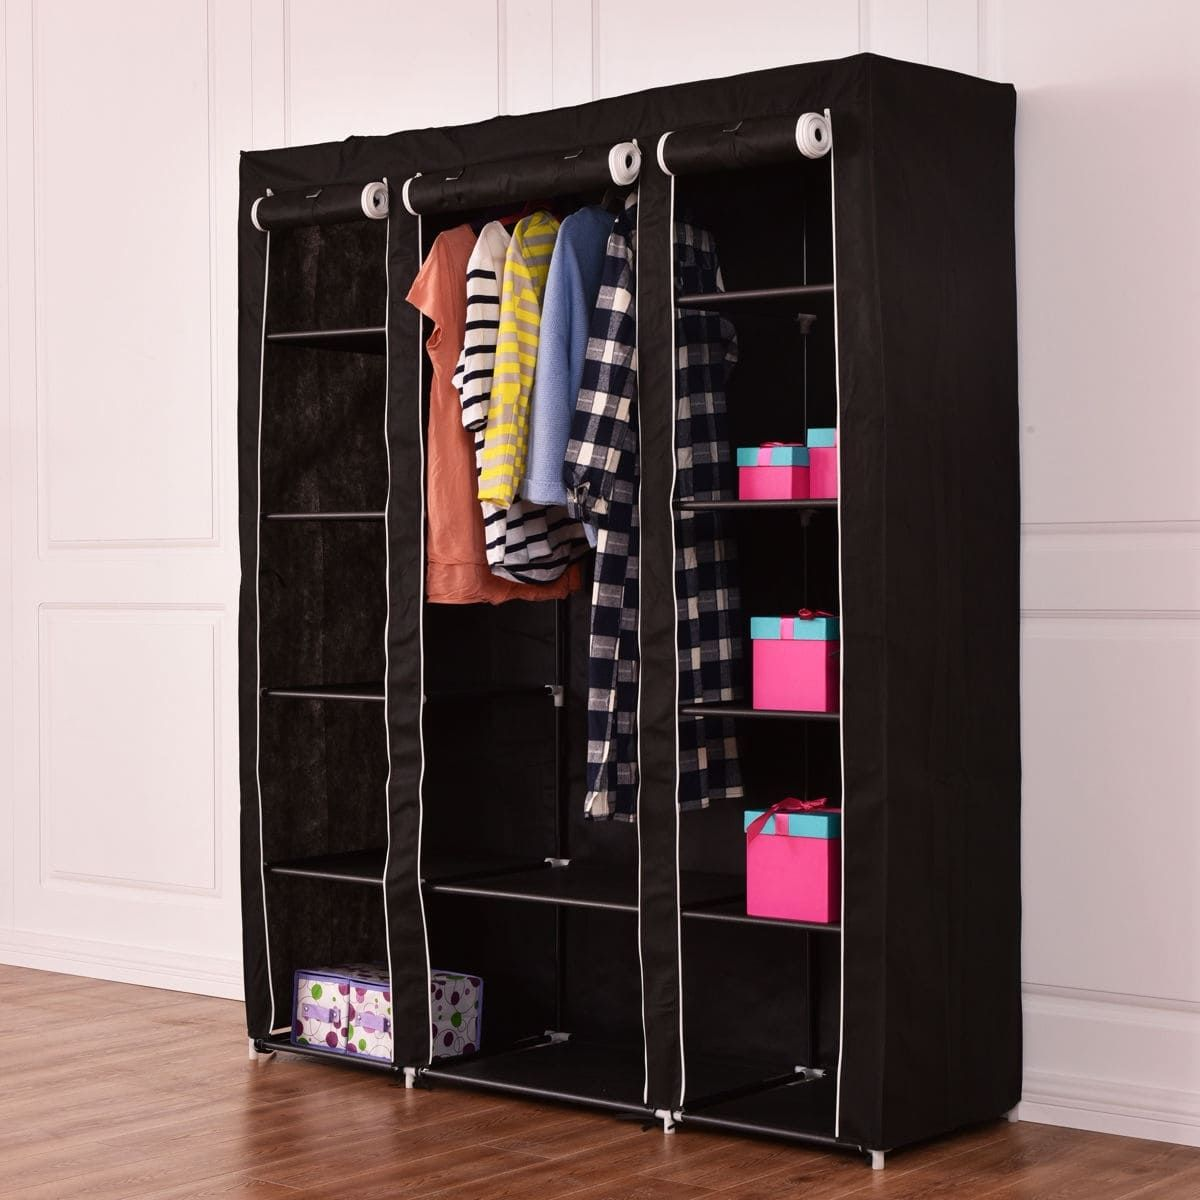 a6cffe27645 Costway 70   Portable Closet Storage Organizer Clothes Wardrobe Shoe Rack W Shelves  Black (Fabric)